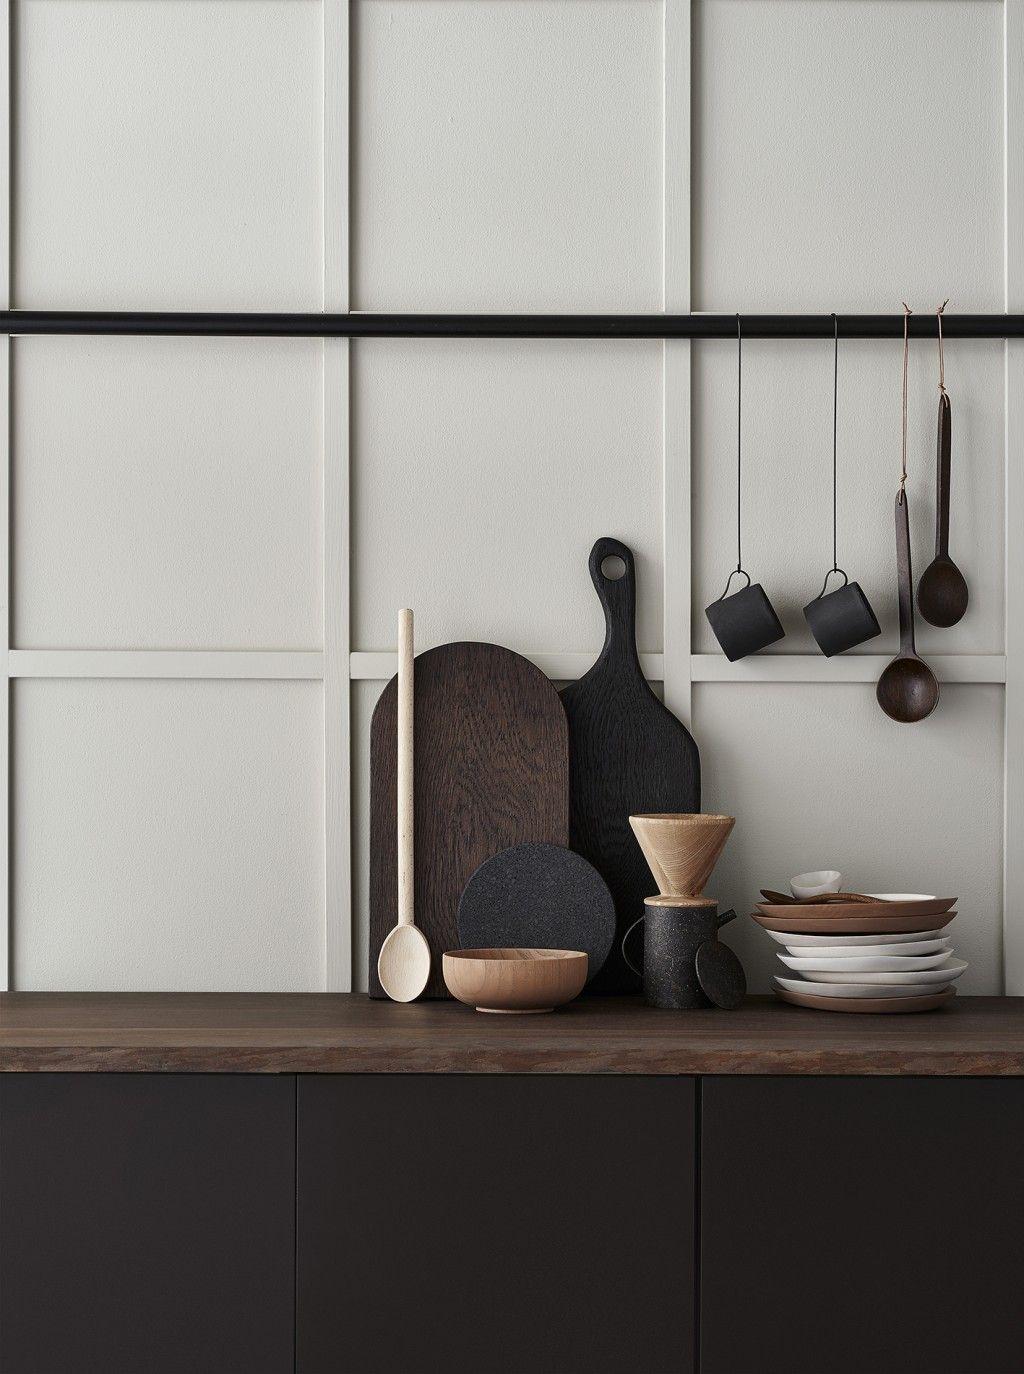 Pin by tiina ruohonen on vm pinterest kitchens interiors and